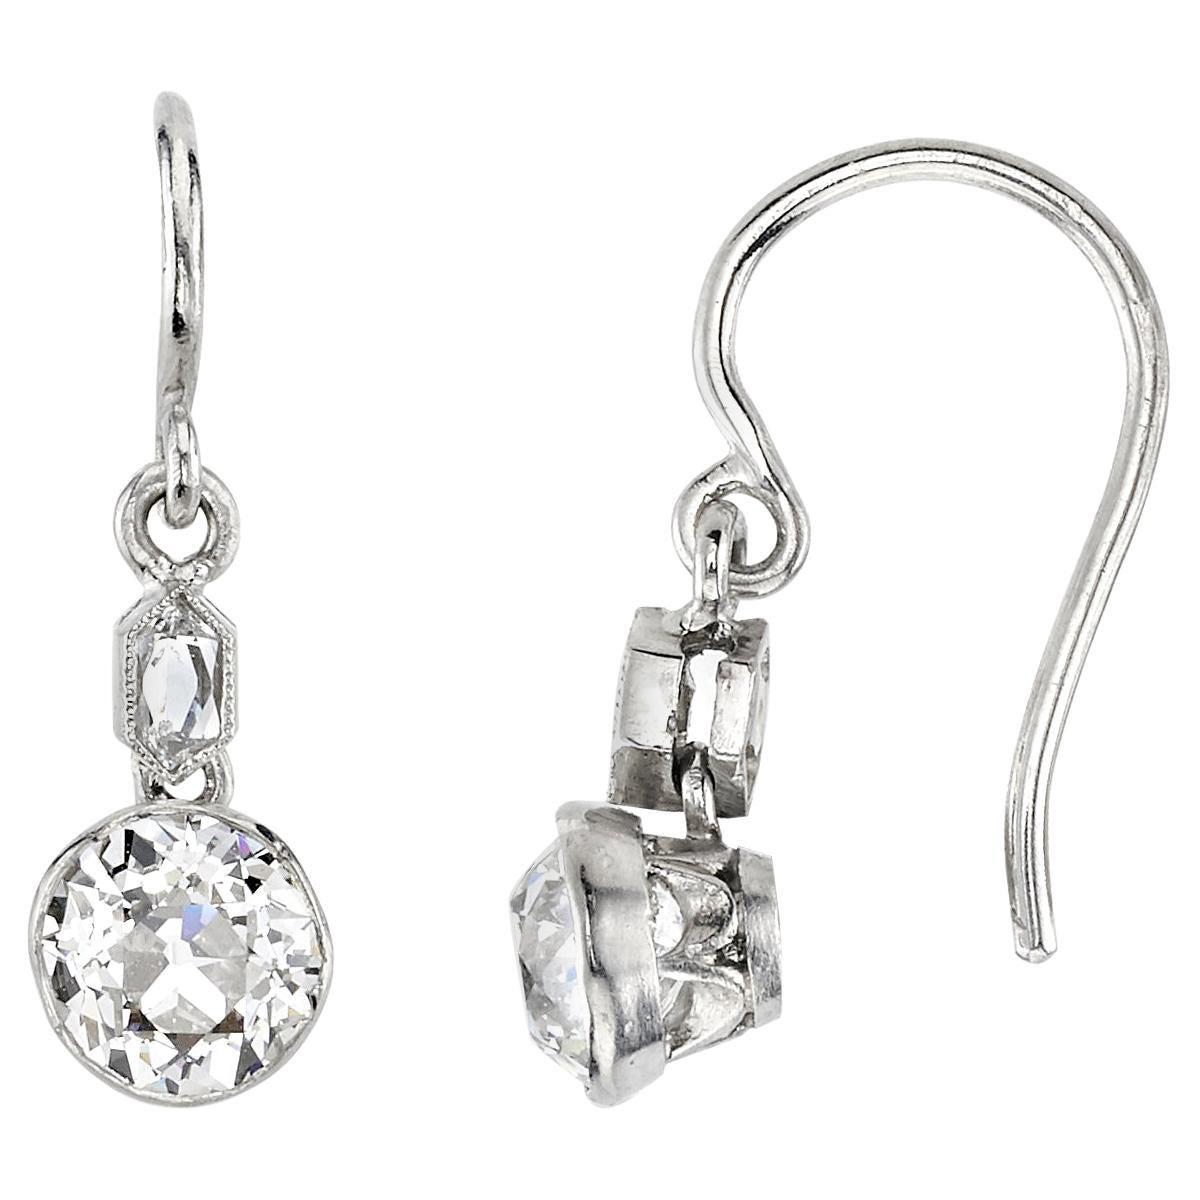 Handcrafted Duprie Old Mine Cut Diamond Drop Earrings by Single Stone